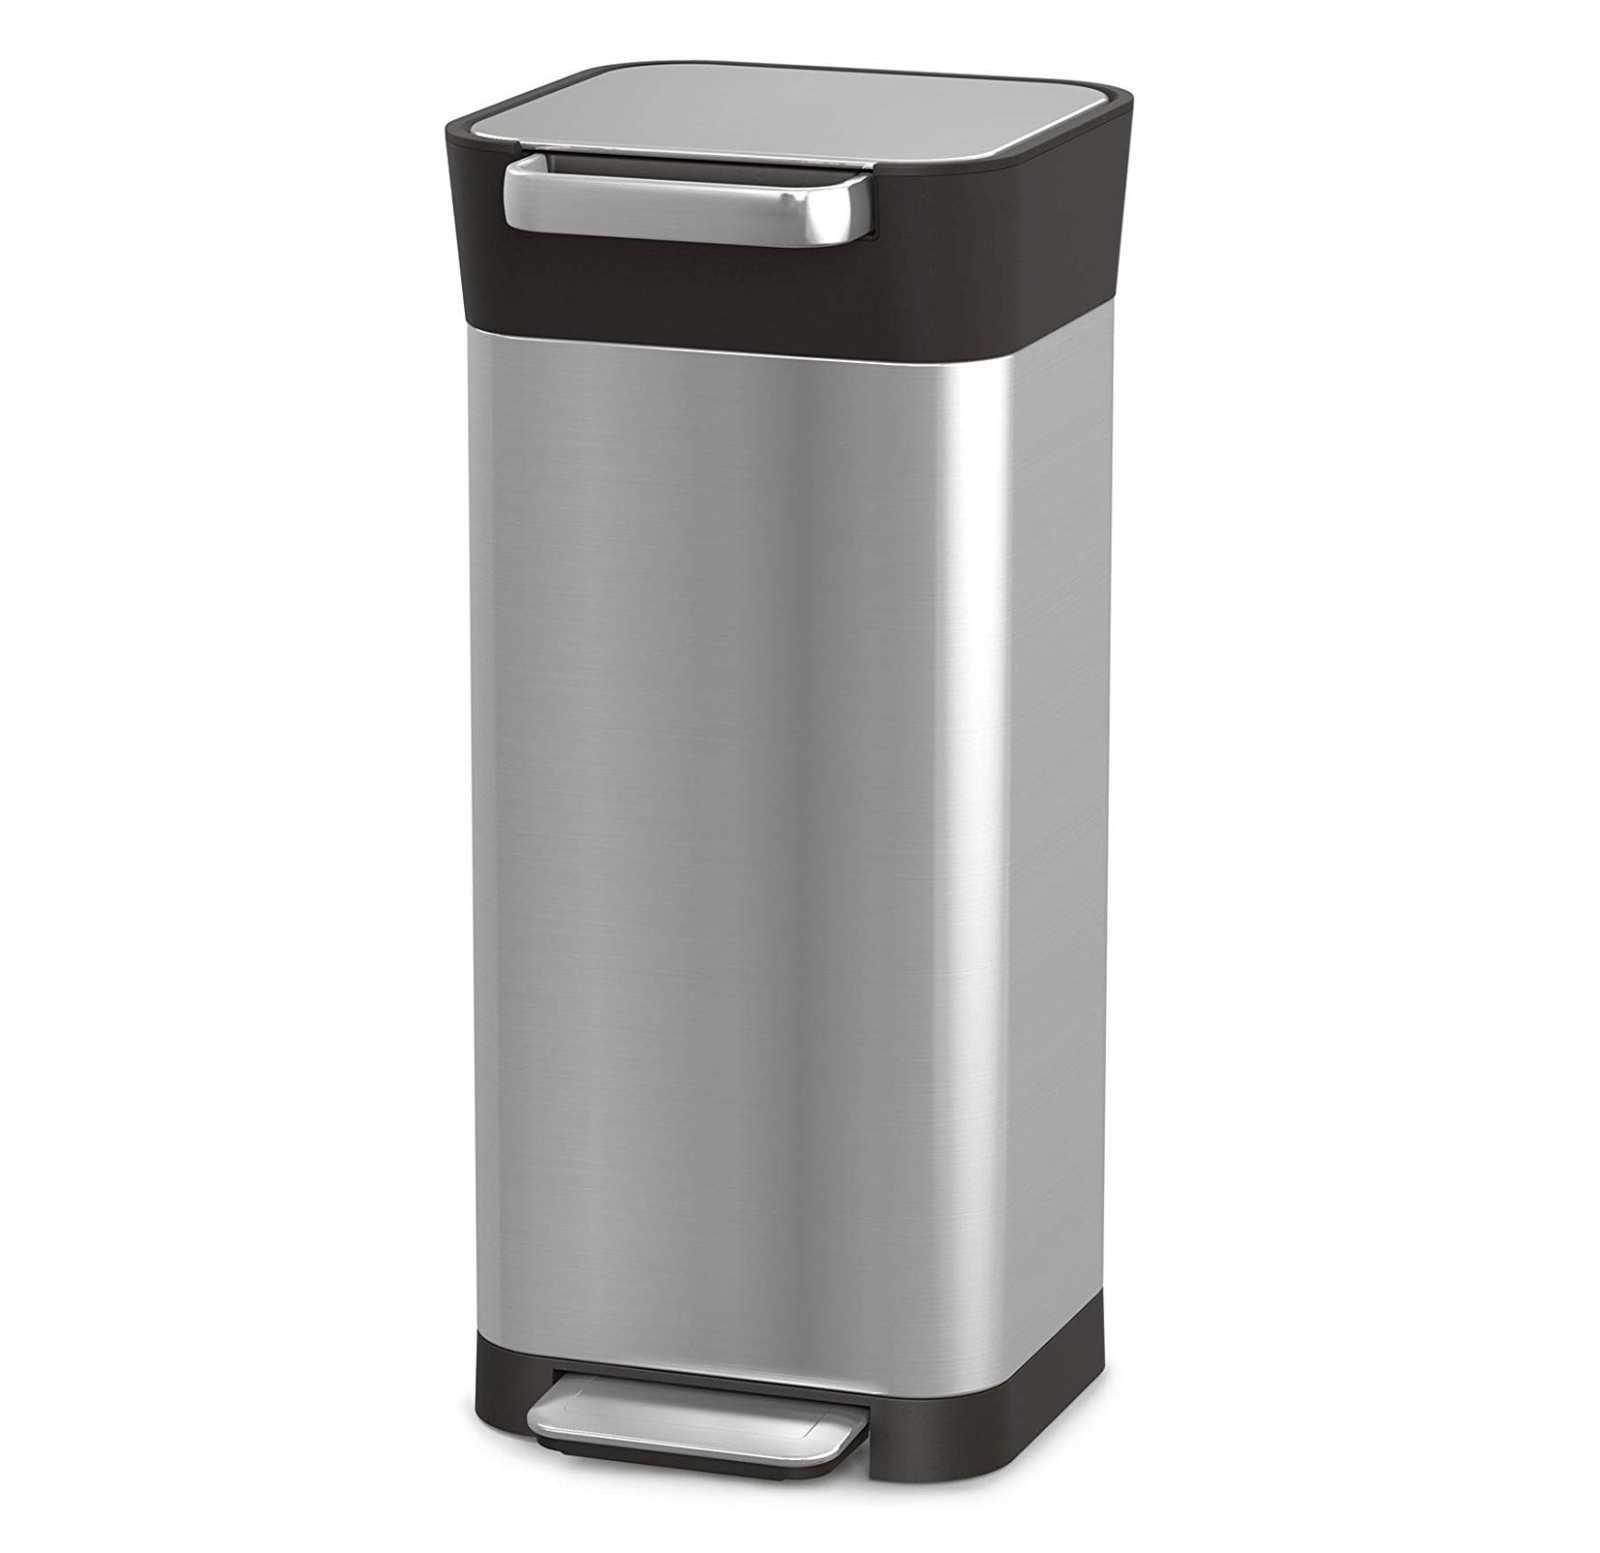 Онлайн каталог PROMENU: Органайзер для мусора Joseph Joseph INTELLEGENT WASTE, 30,2х34,4 см, объем 20 л, серебристый Joseph Joseph 30037